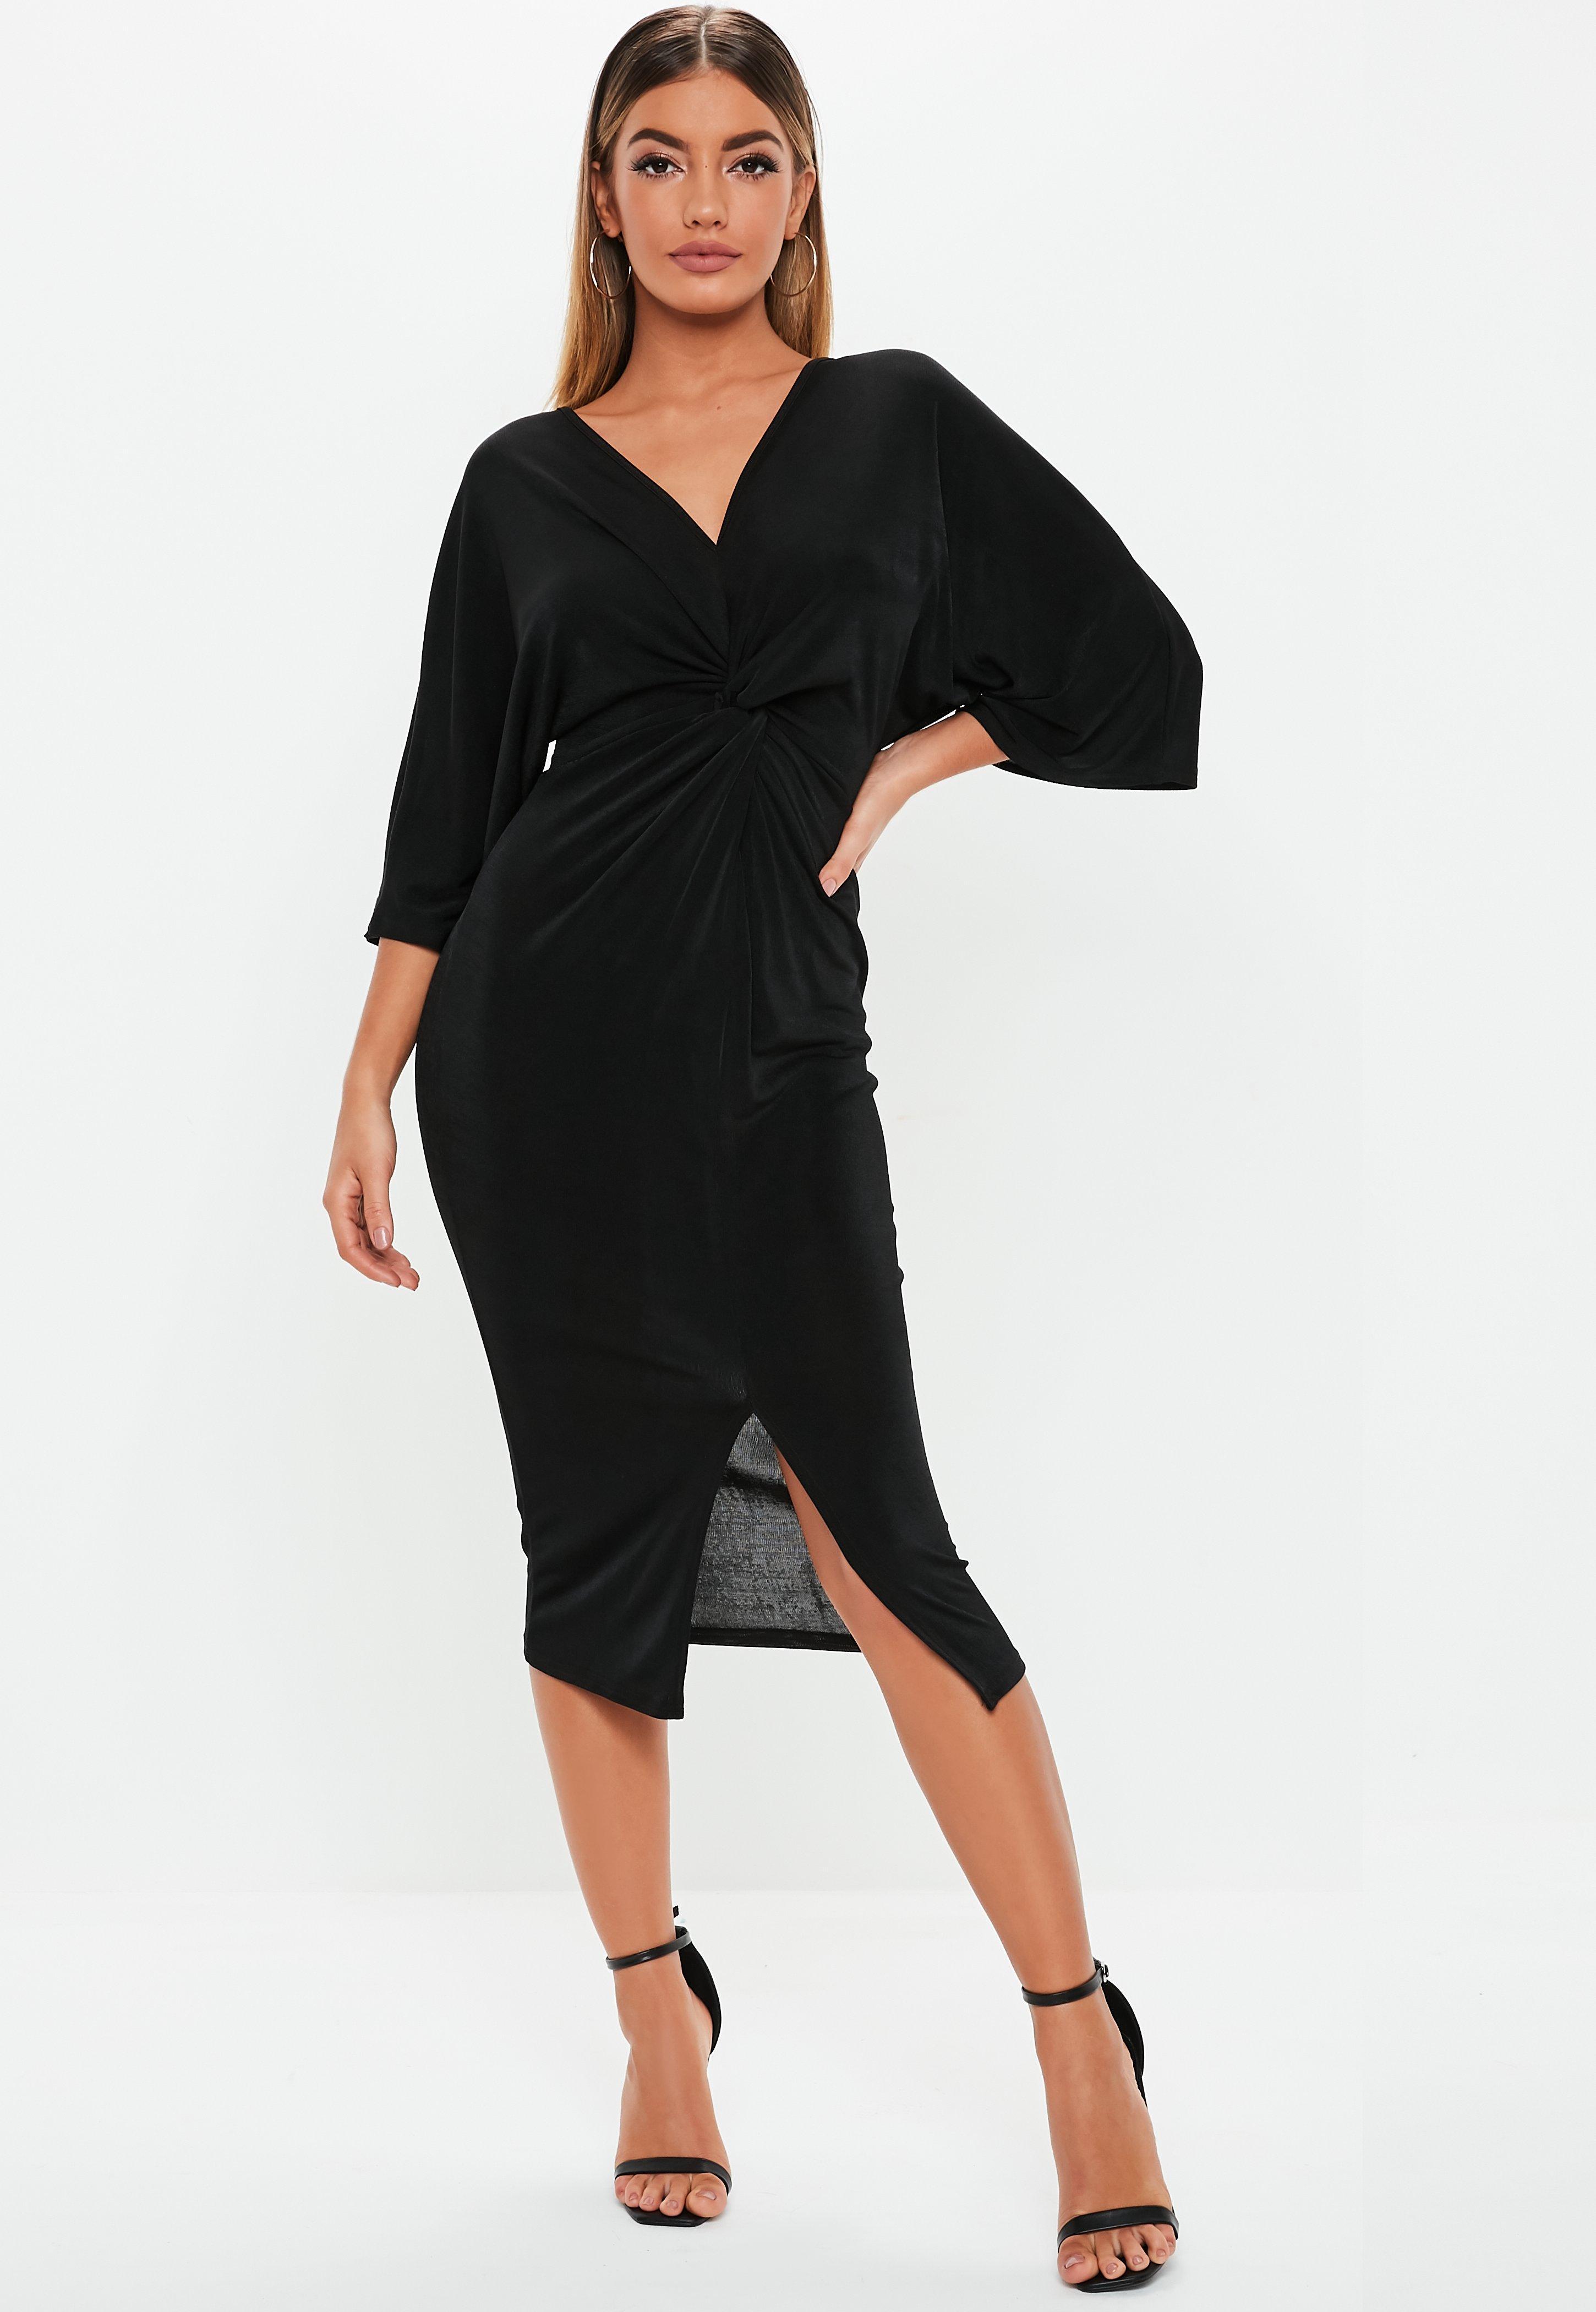 d8a8fc6b2c93 Kleider für Damen - Missguided DE